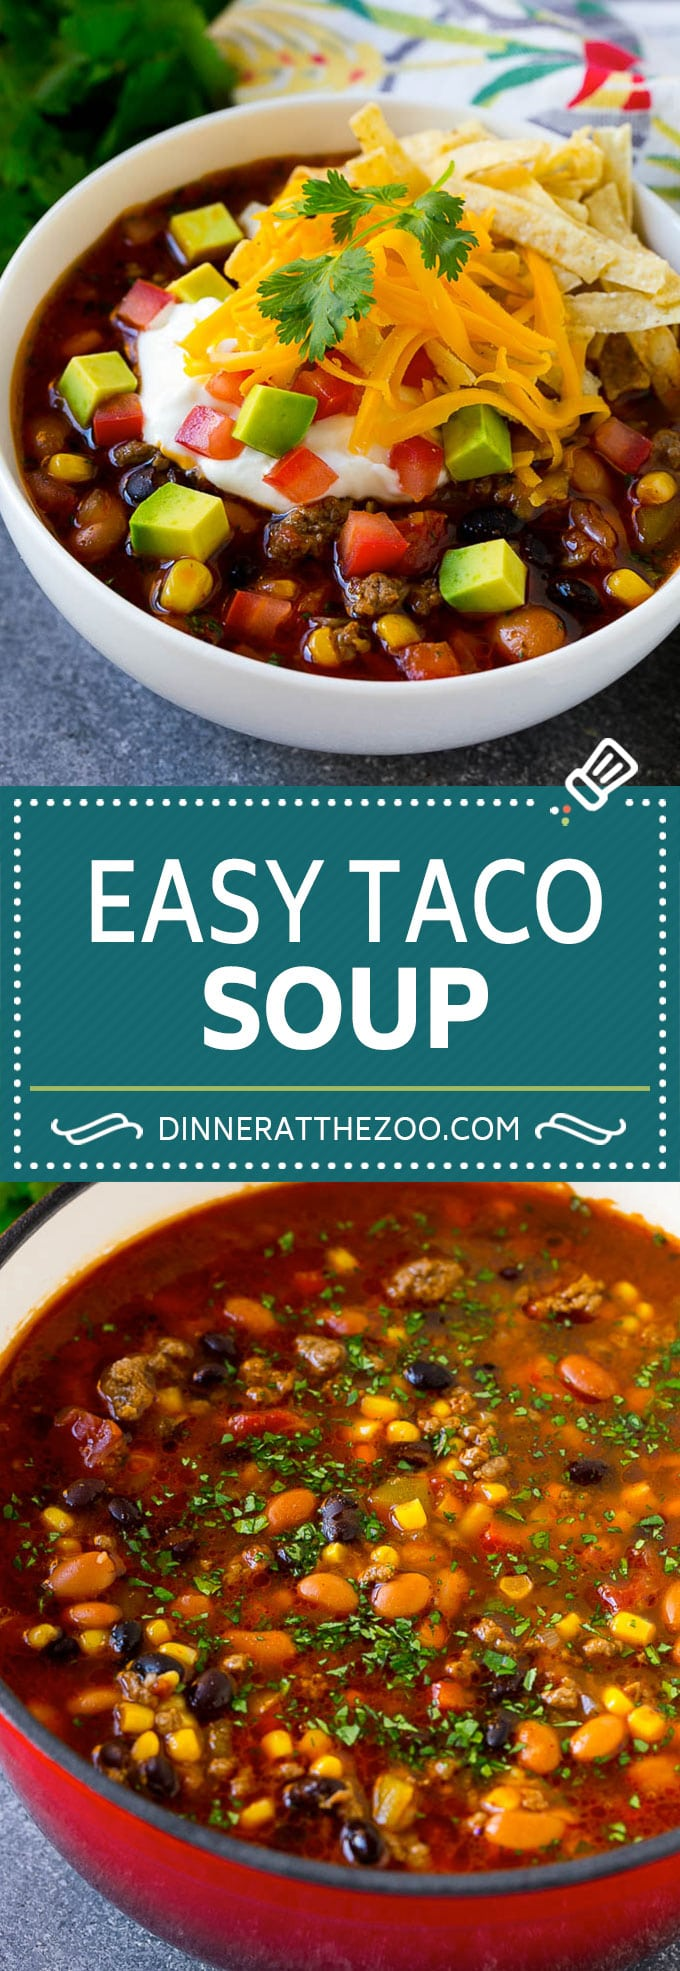 Taco Soup Recipe | Beef Taco Soup | Mexican Soup #soup #beef #taco #mexicanfood #beans #dinner #dinneratthezoo